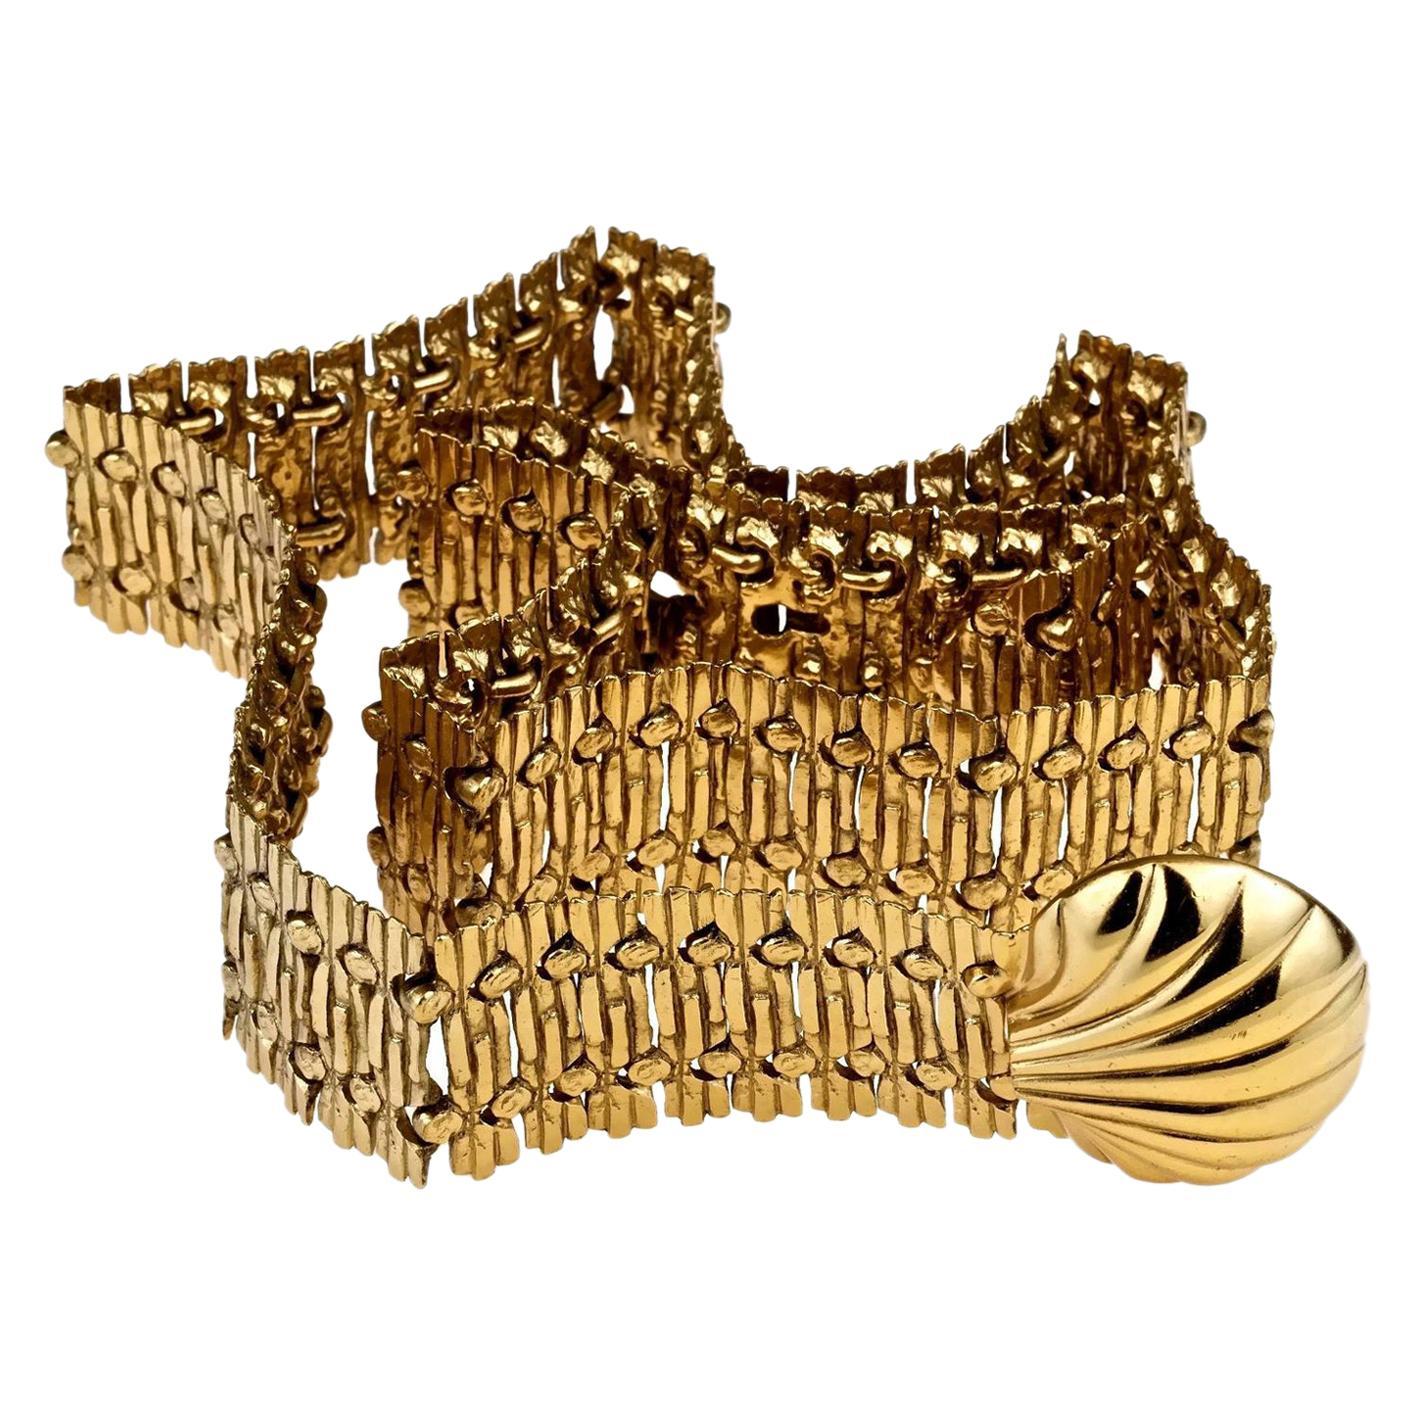 Vintage YVES SAINT LAURENT Ysl Shell Textured Metal Belt